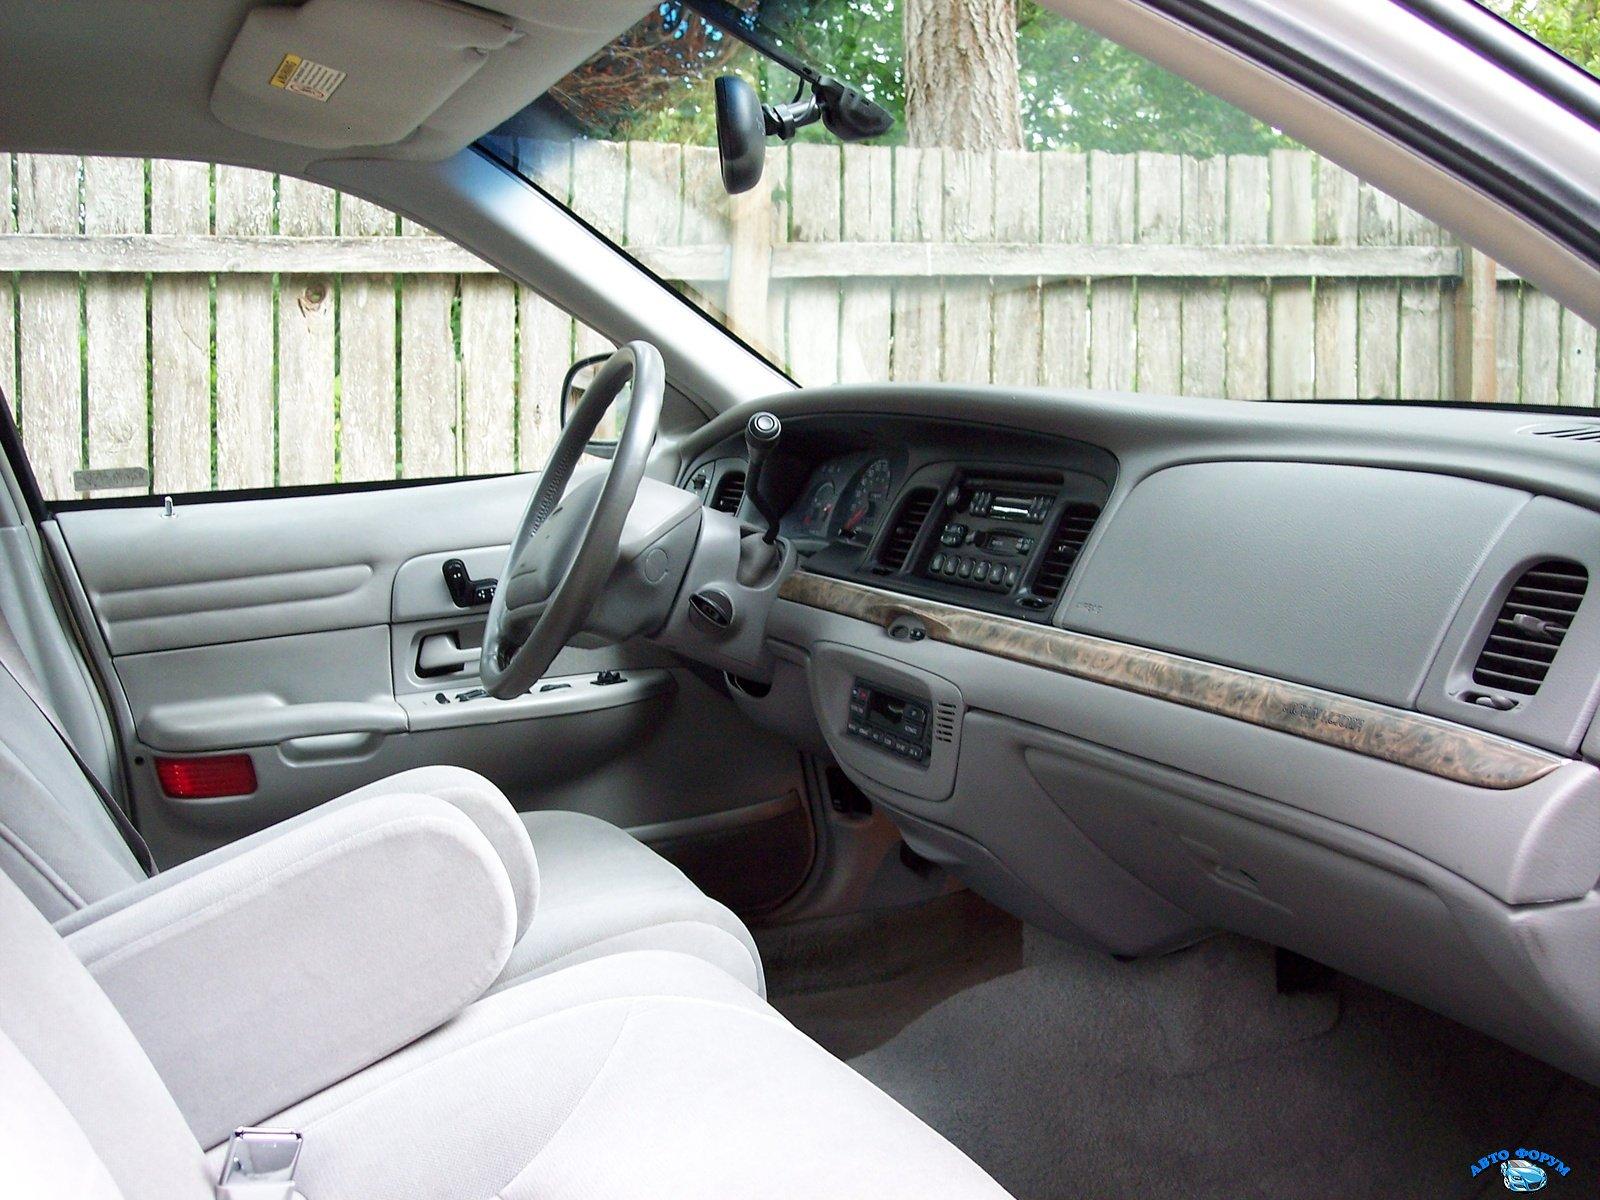 1999_ford_crown_victoria_4_dr_lx_sedan-pic-38335.jpeg